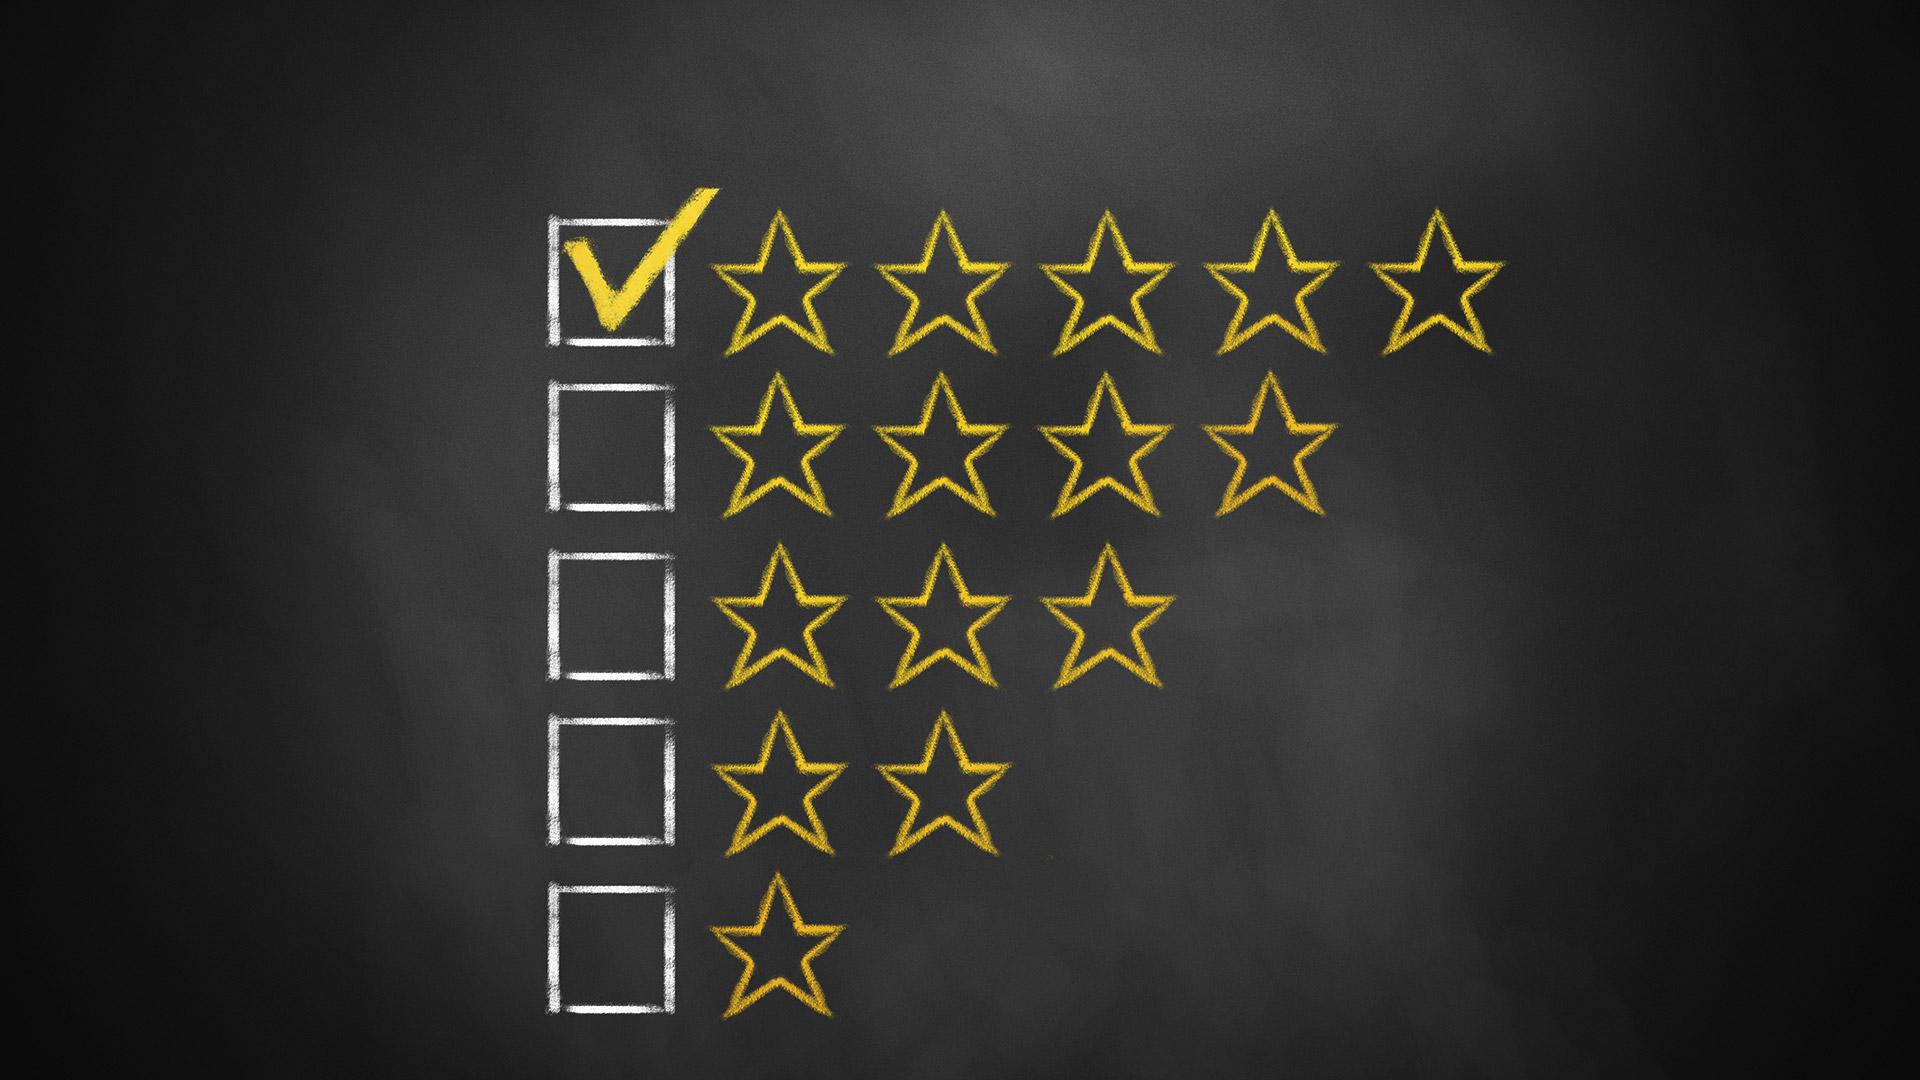 reviews-ratings-stars-ss-1920.jpg